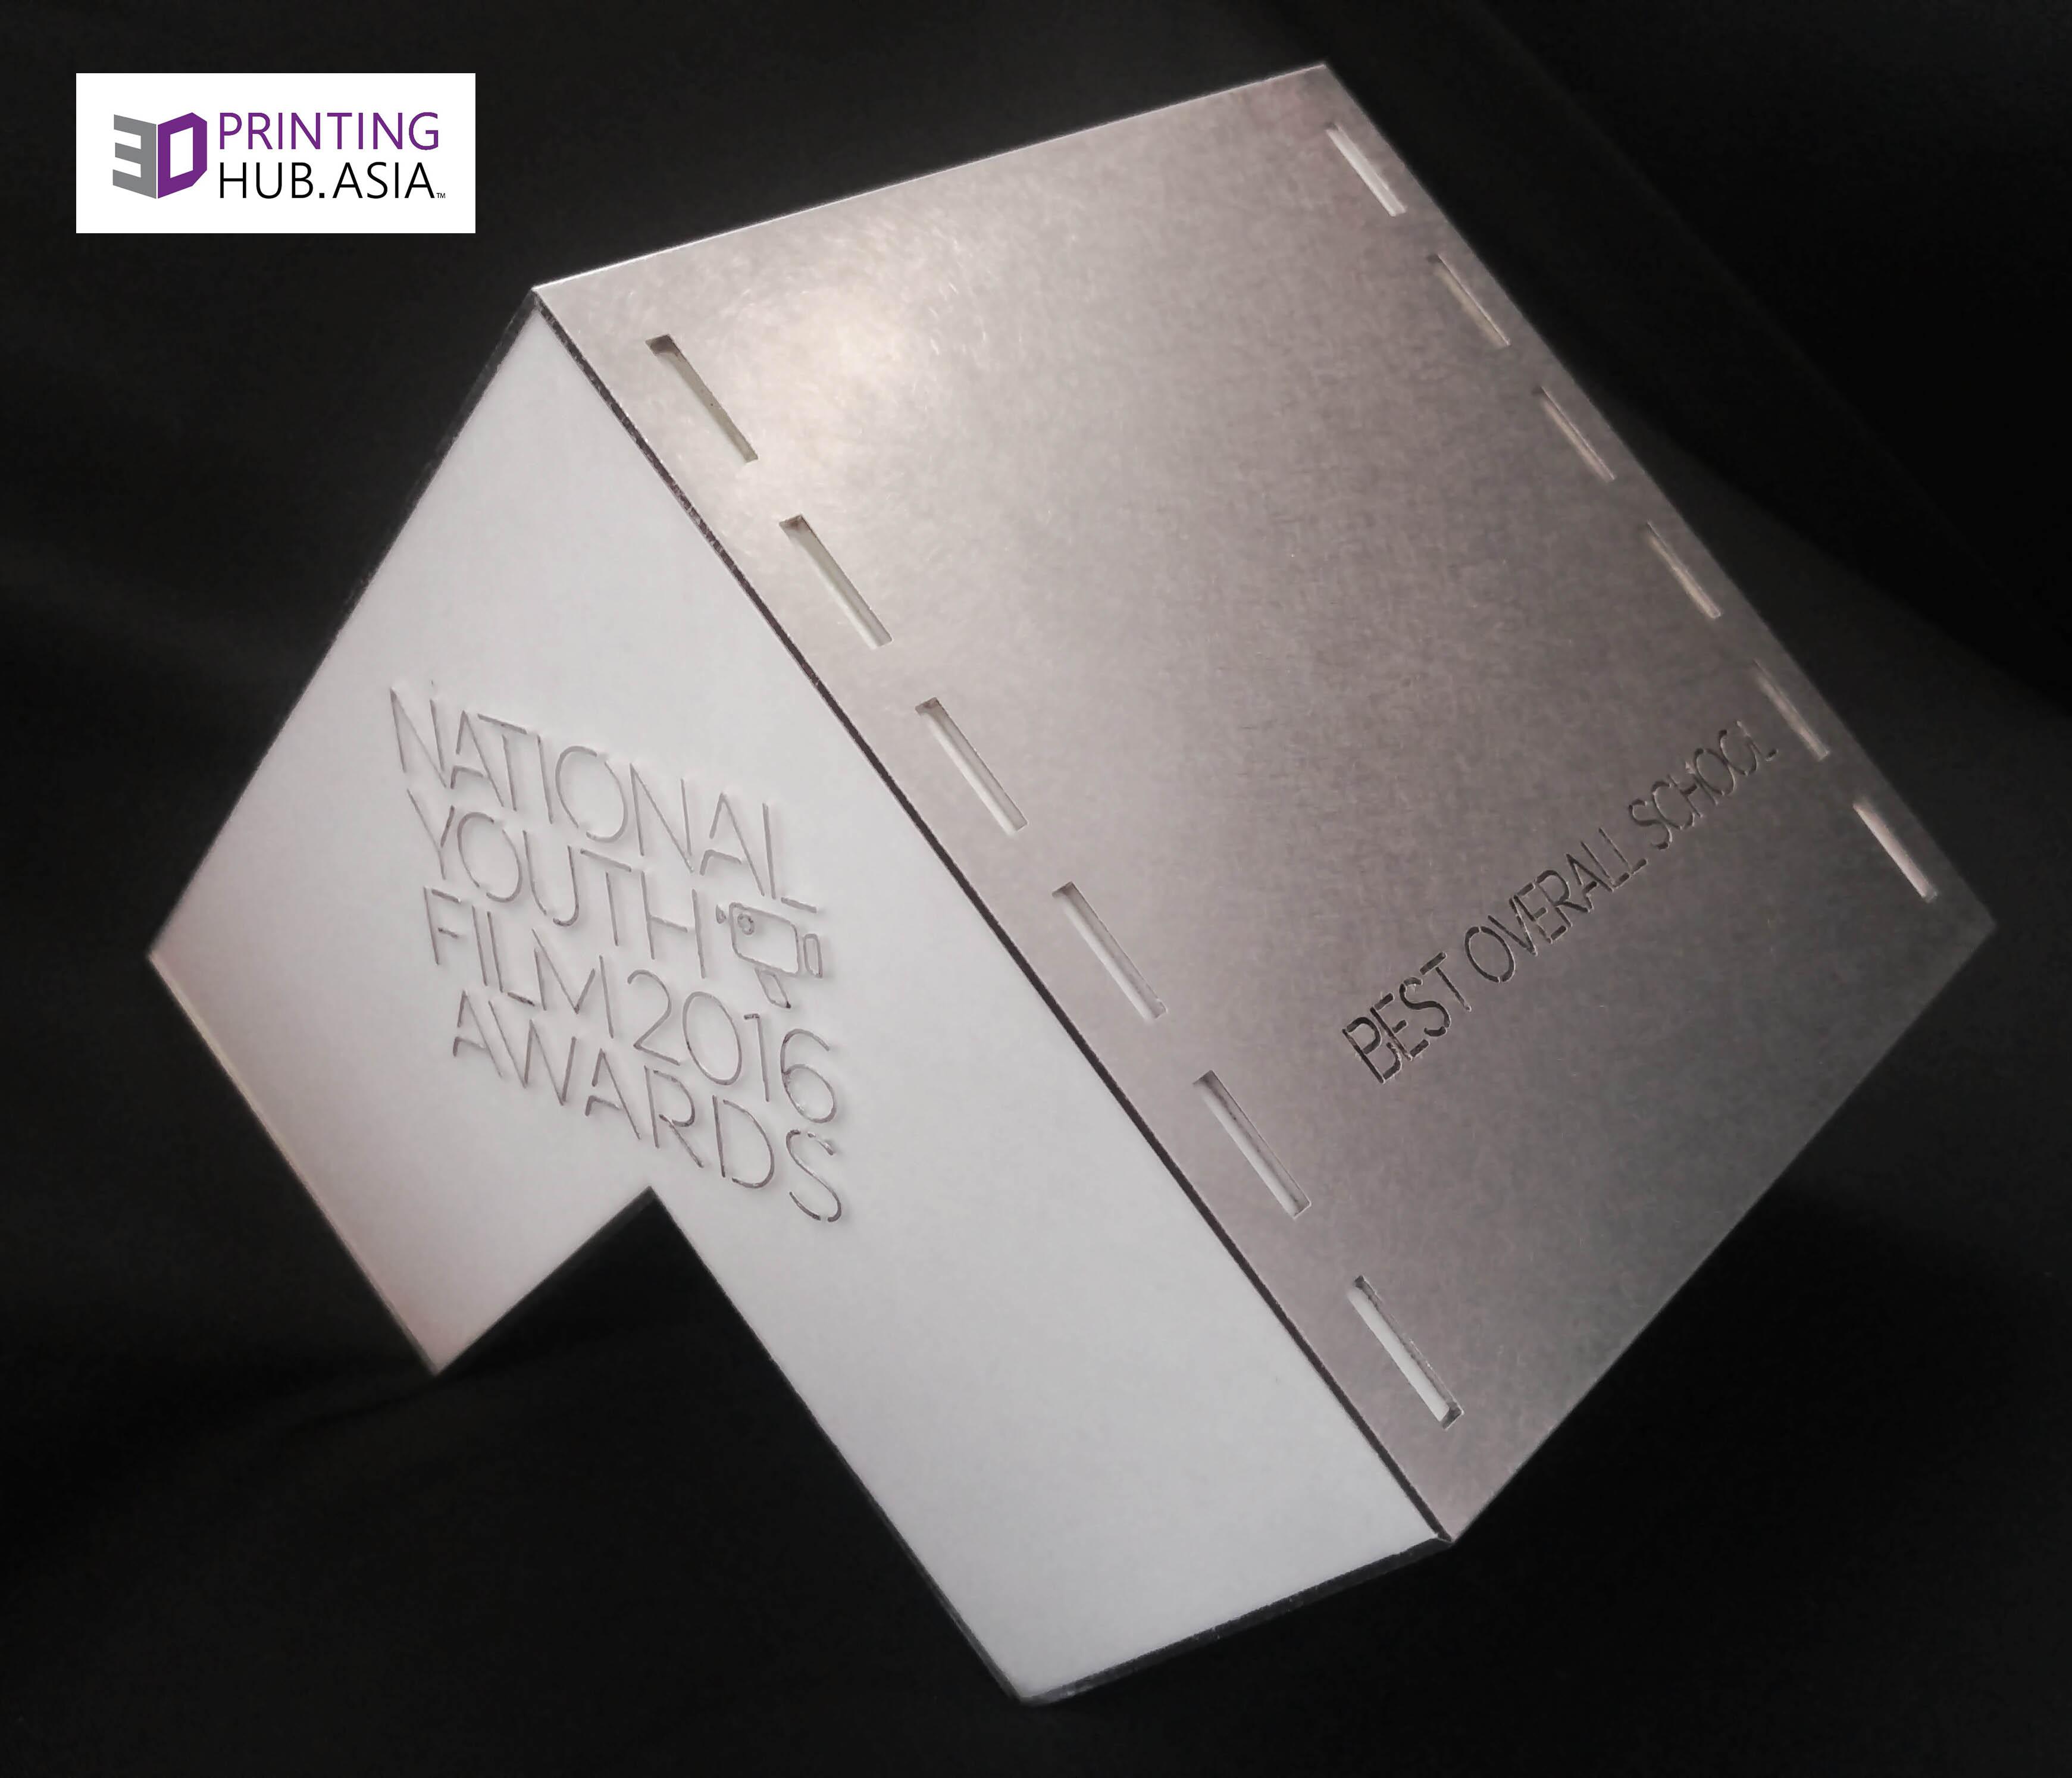 NYFA2016 Award by 3DPrintingHub.Asia